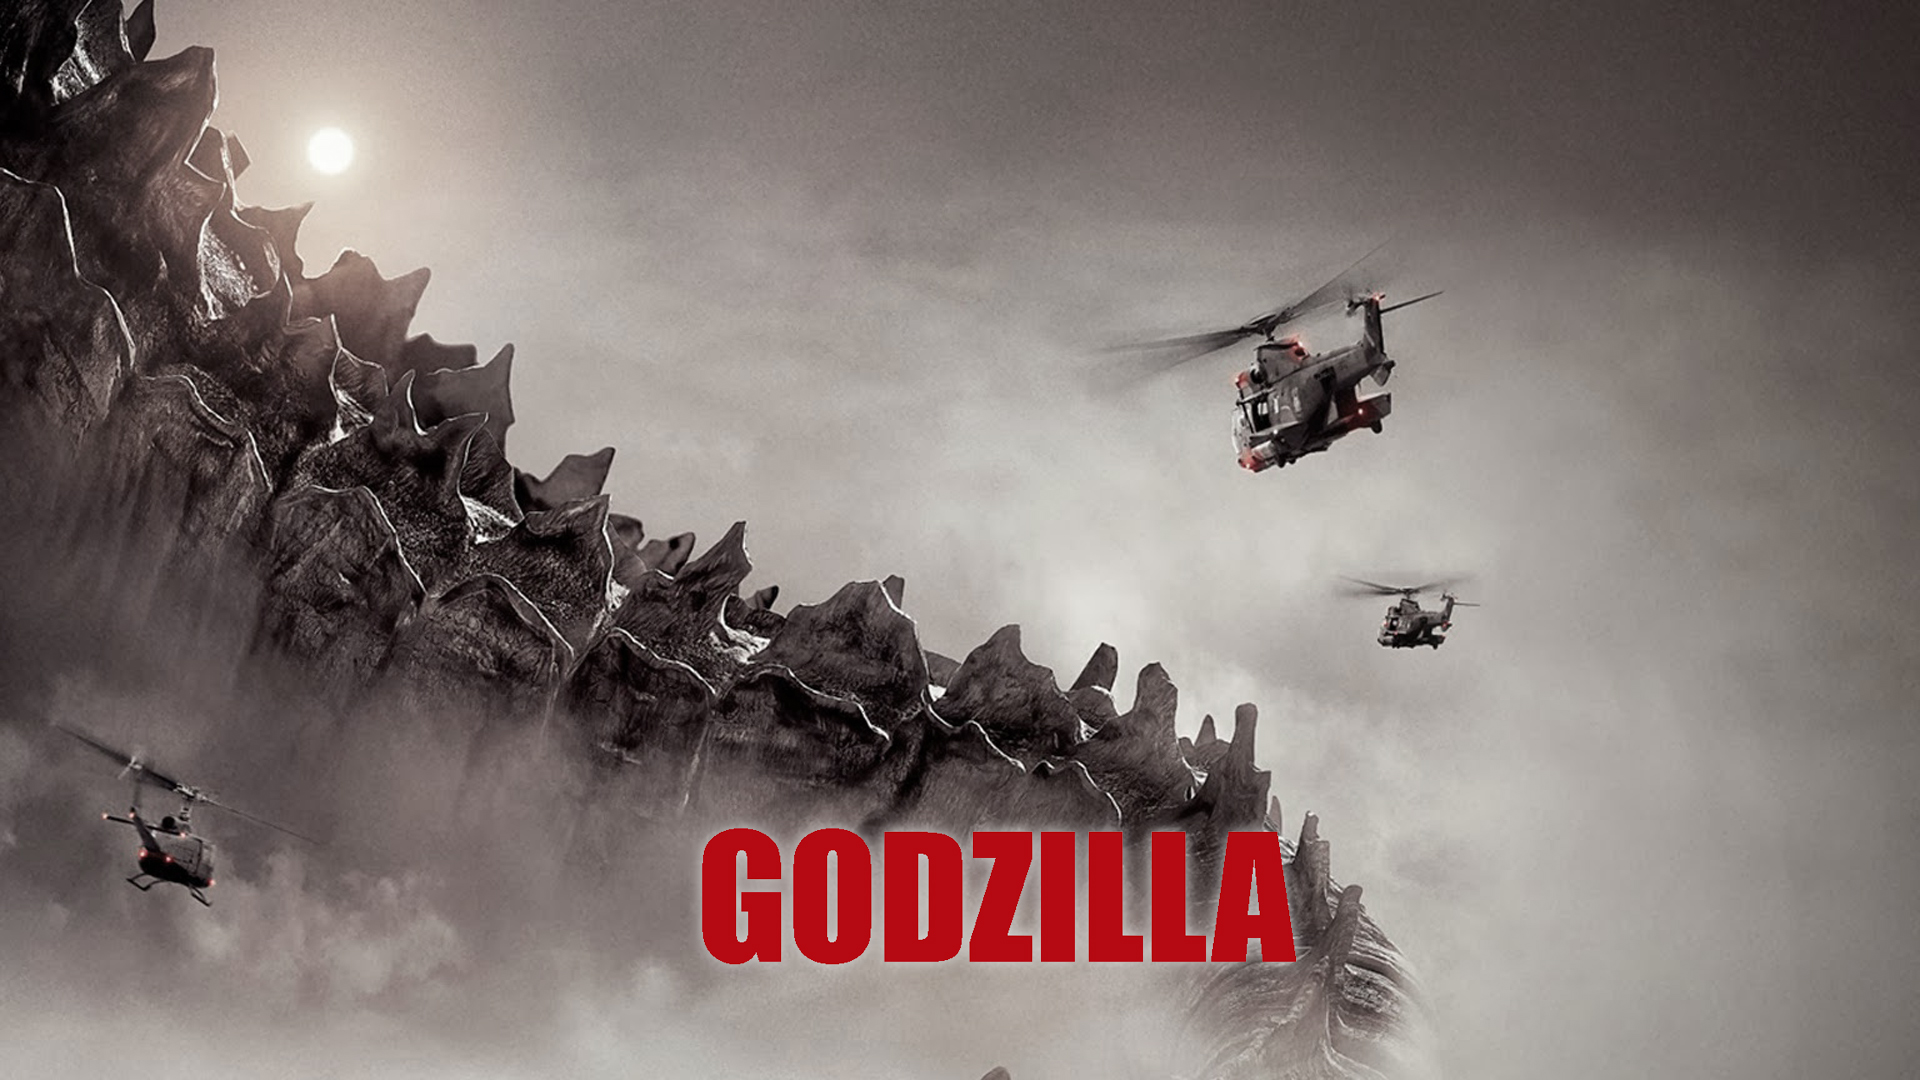 godzilla-2014-poster.jpg